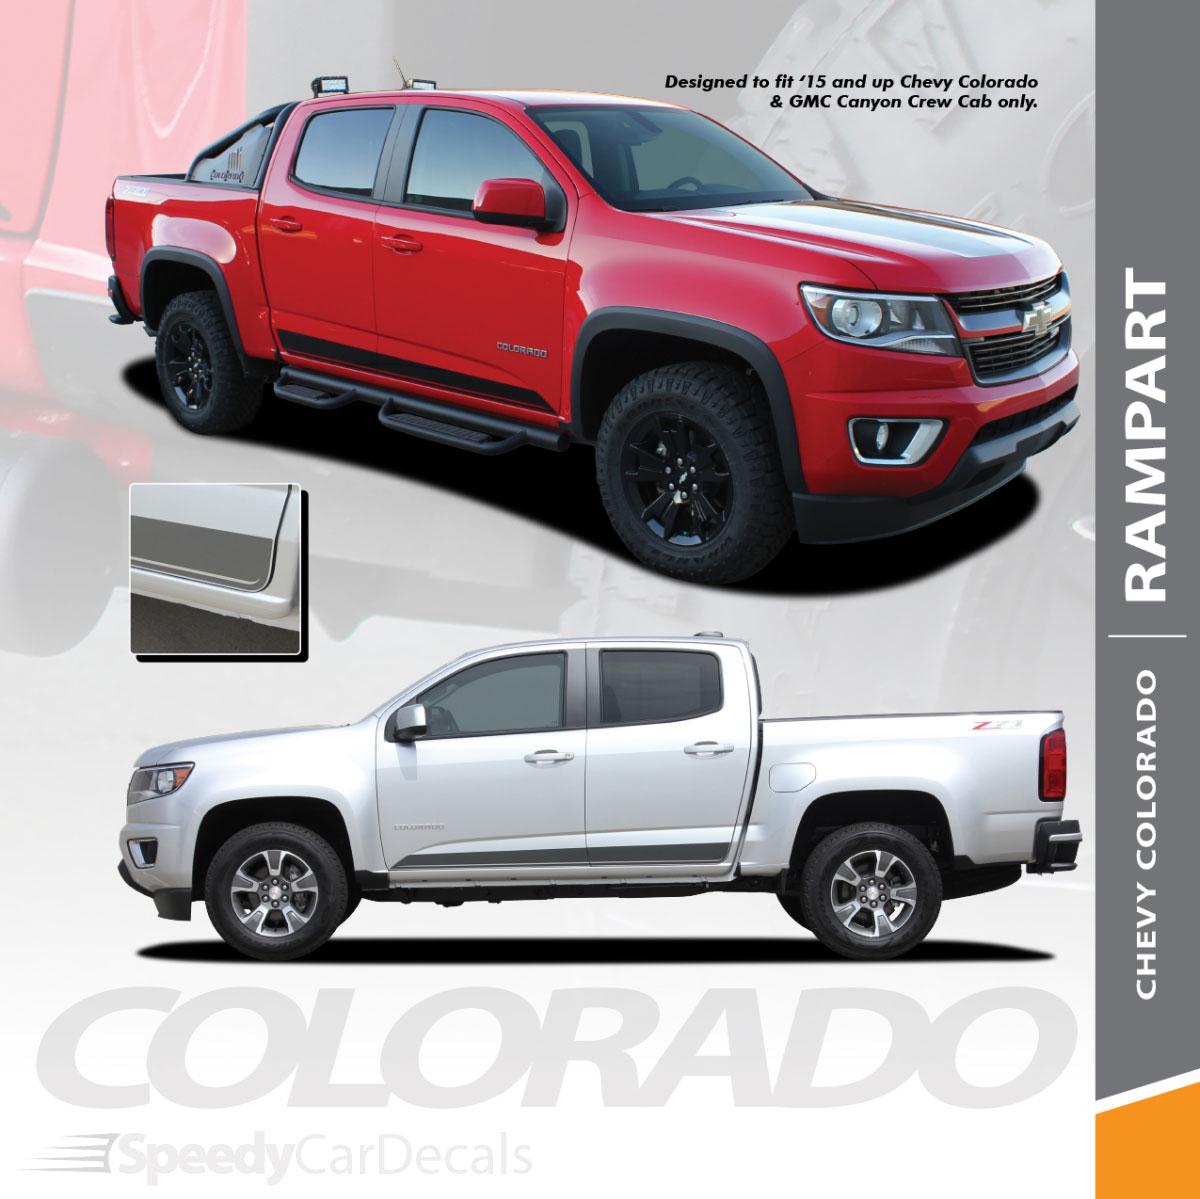 Chevy Colorado Side Stripes Graphics RAMPART 2015 2016 2017 2018 2019 Black  Premium and Supreme Install Vinyl